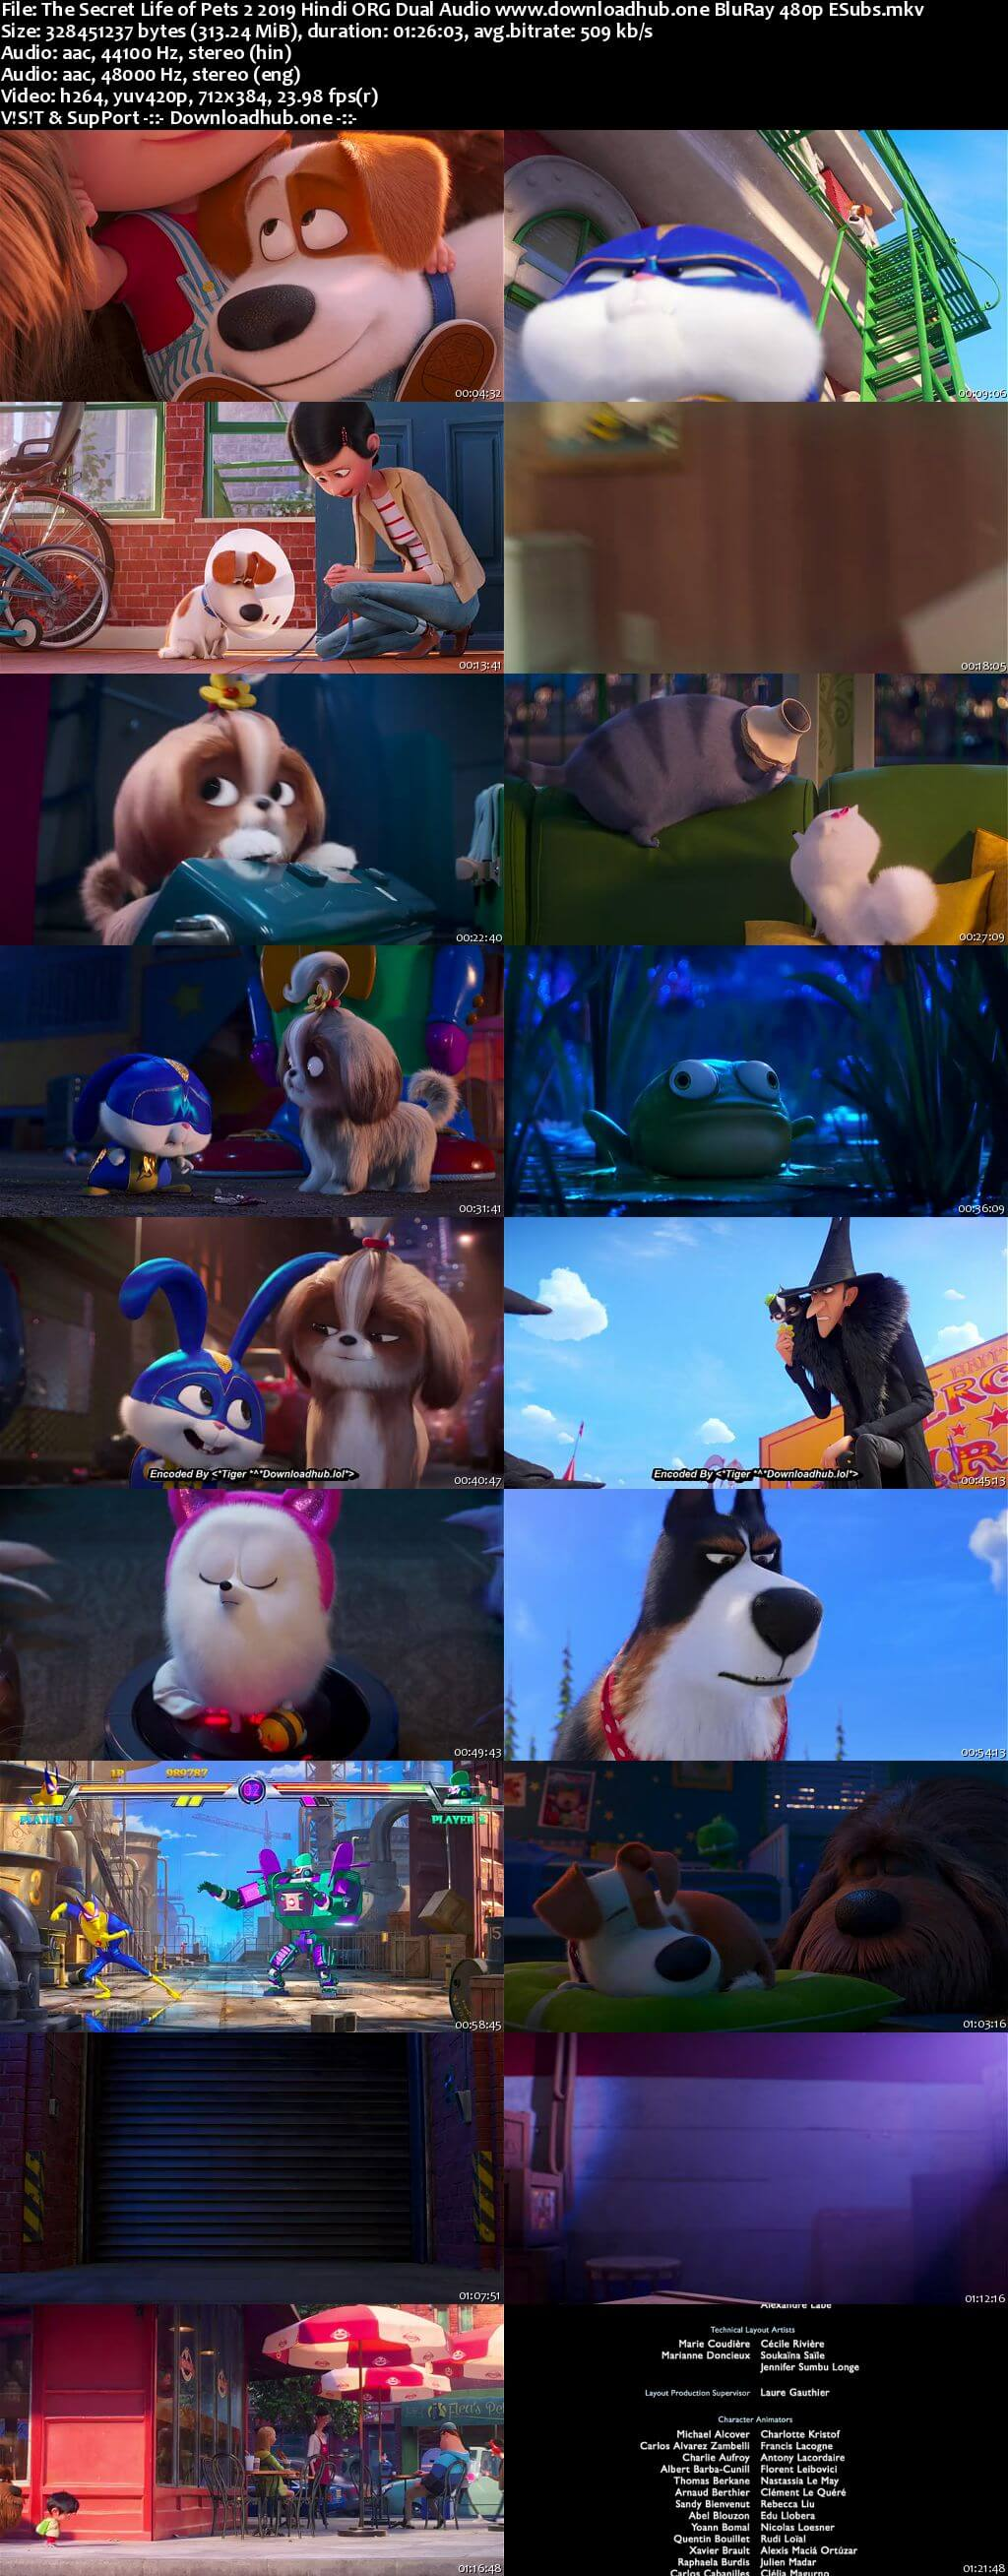 The Secret Life of Pets 2 2019 Hindi ORG Dual Audio 300MB BluRay 480p ESubs